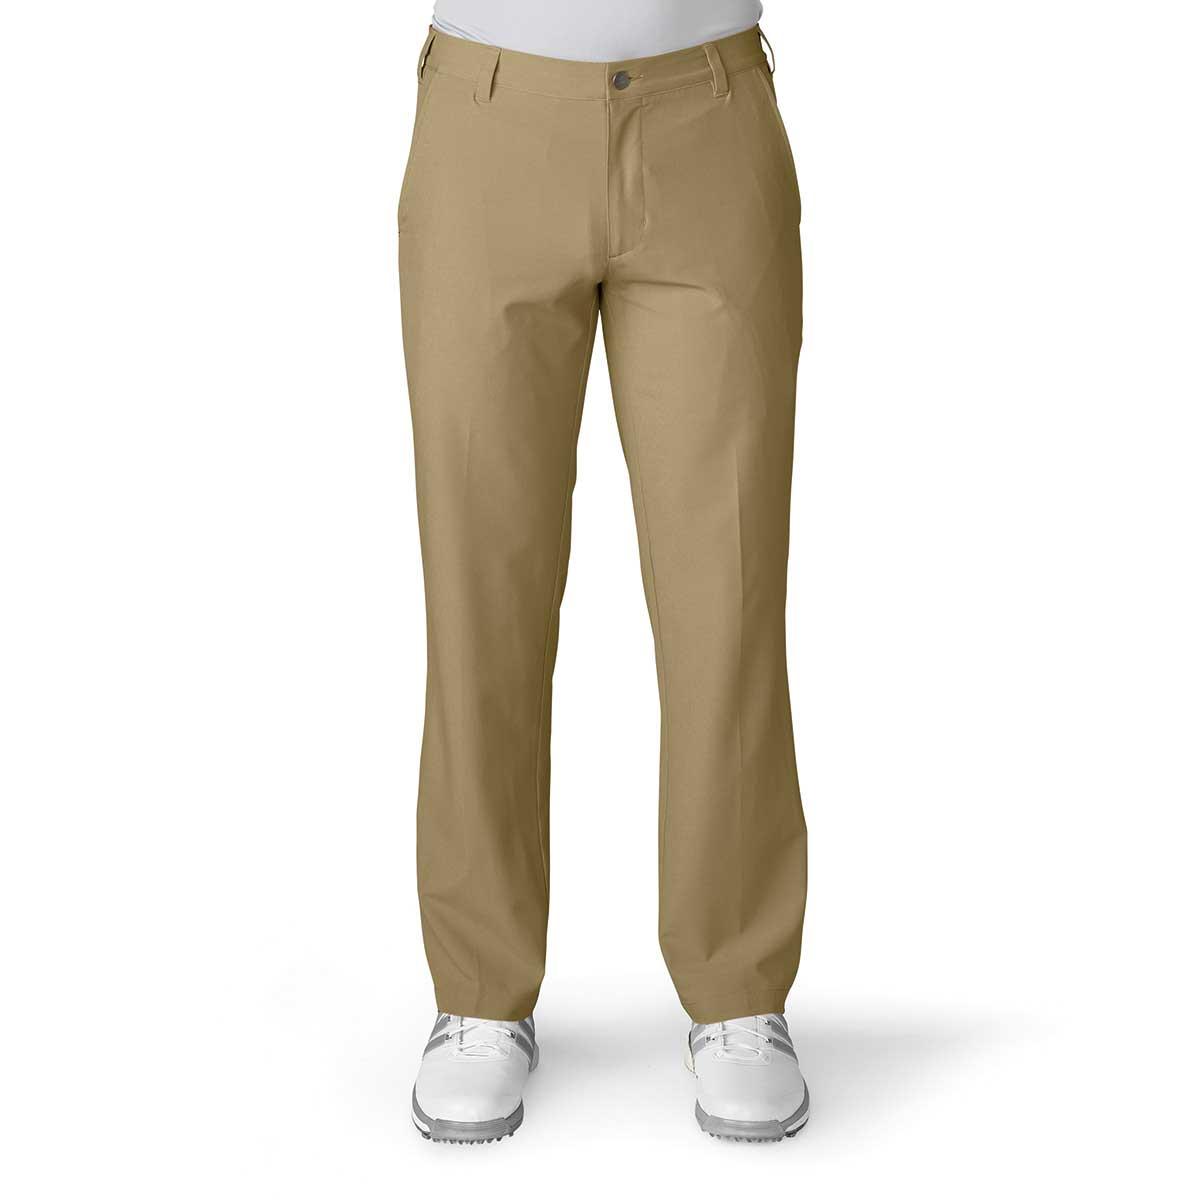 Adidas Ultimate 365 Flat Front Khaki Pant